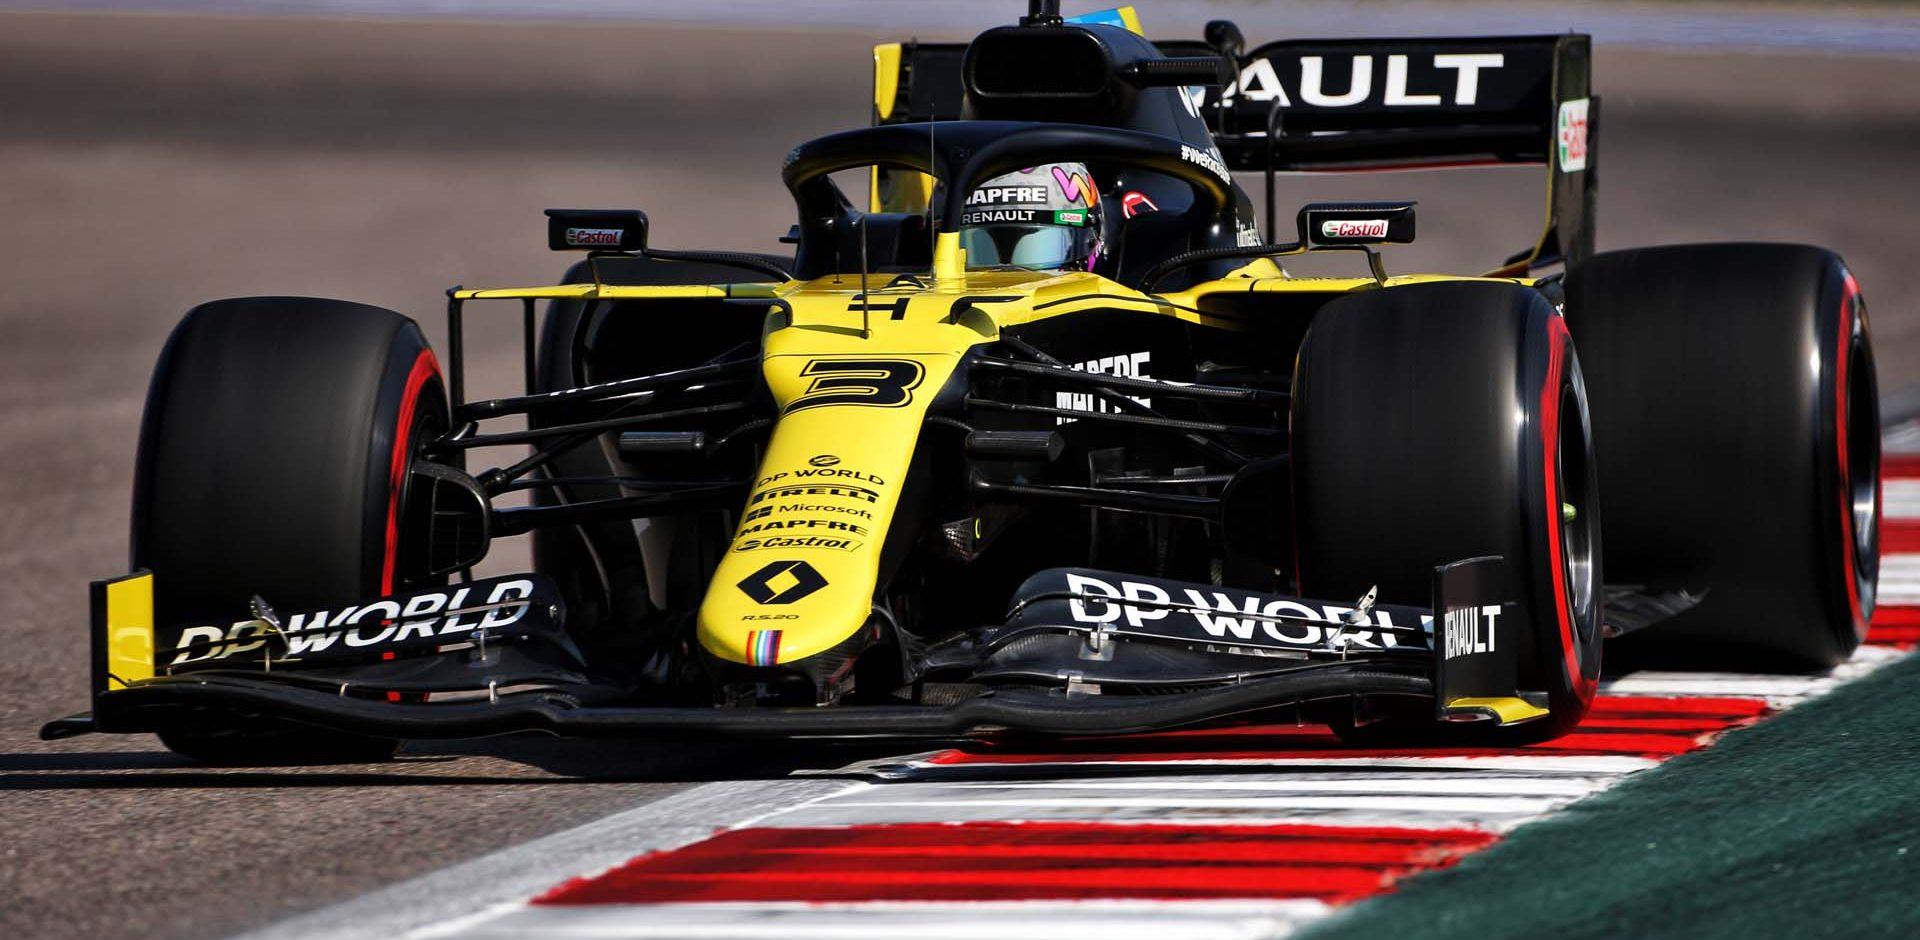 Daniel Ricciardo (AUS) Renault F1 Team RS20. Russian Grand Prix, Friday 25th September 2020. Sochi Autodrom, Sochi, Russia.